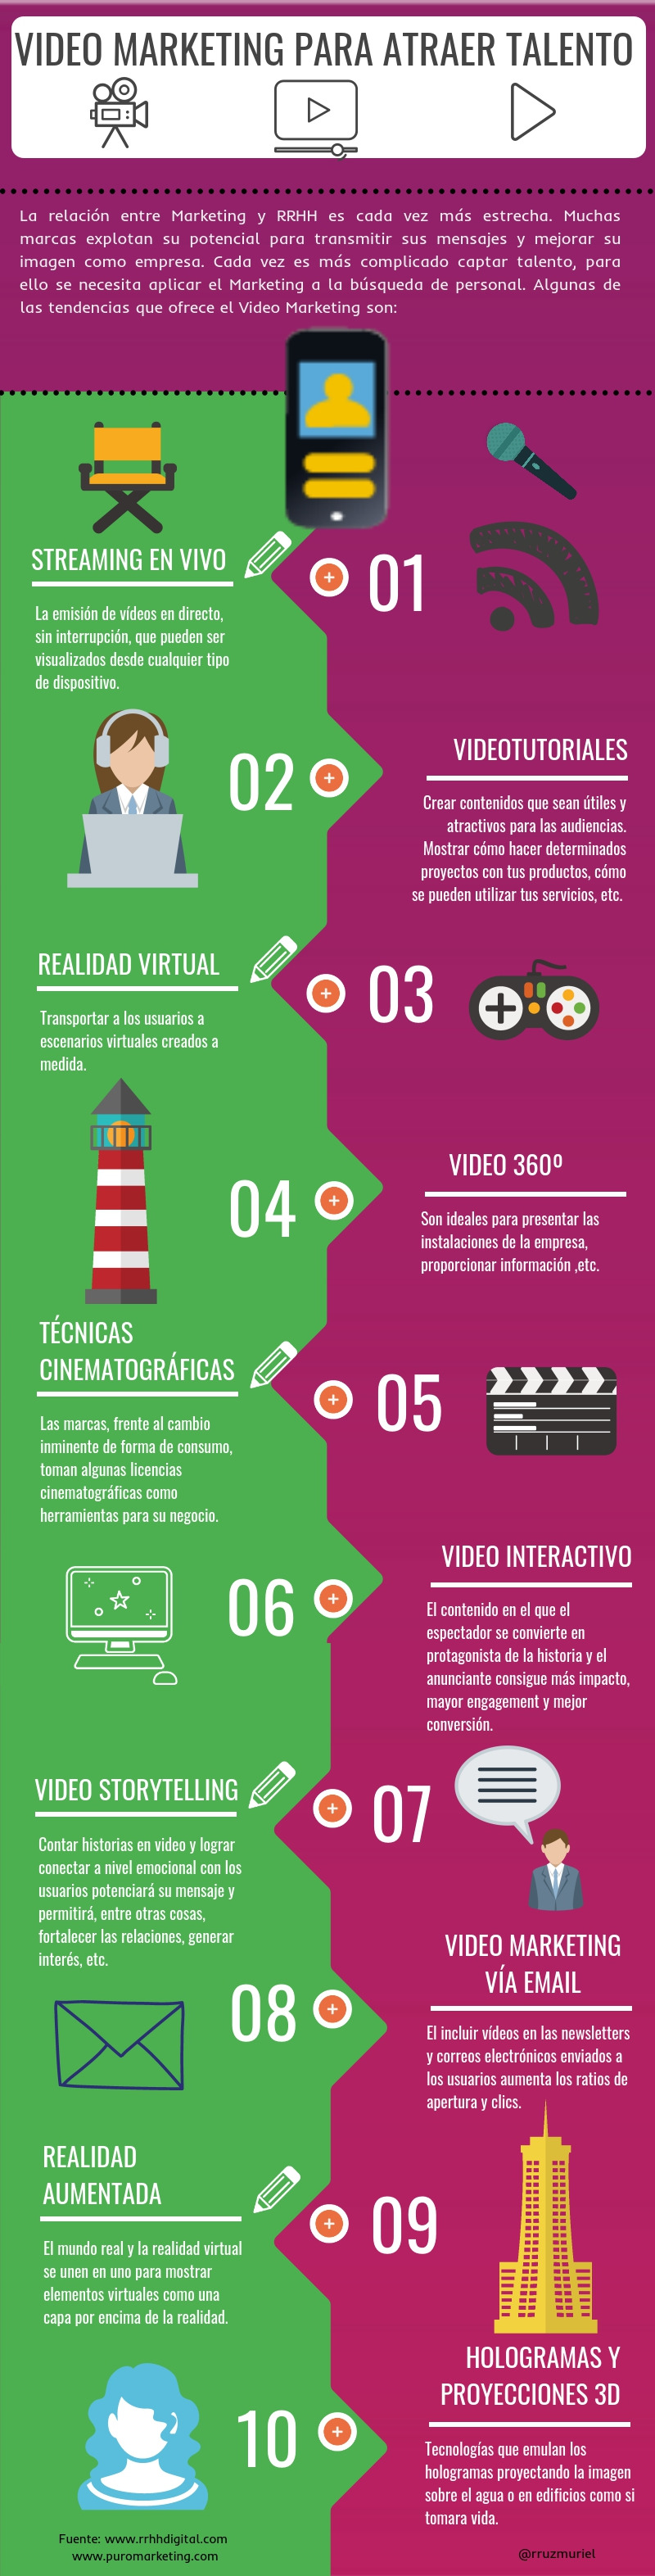 Videomarketing para atraer talento